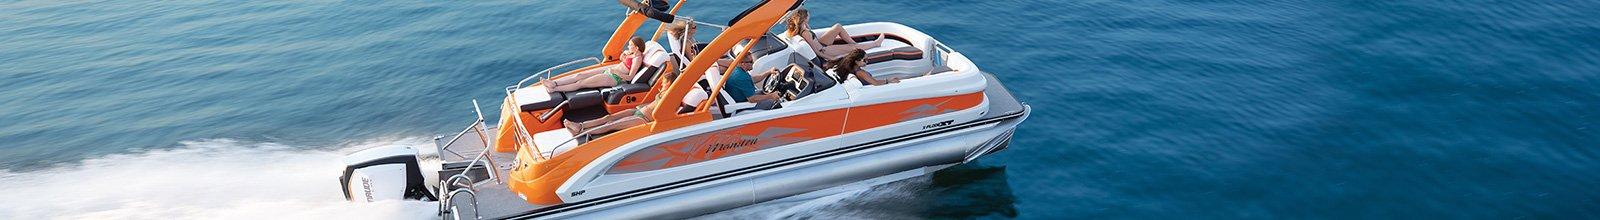 Marine Blue | Best Boat Dealer & Repair Shop | Canandaigua NY